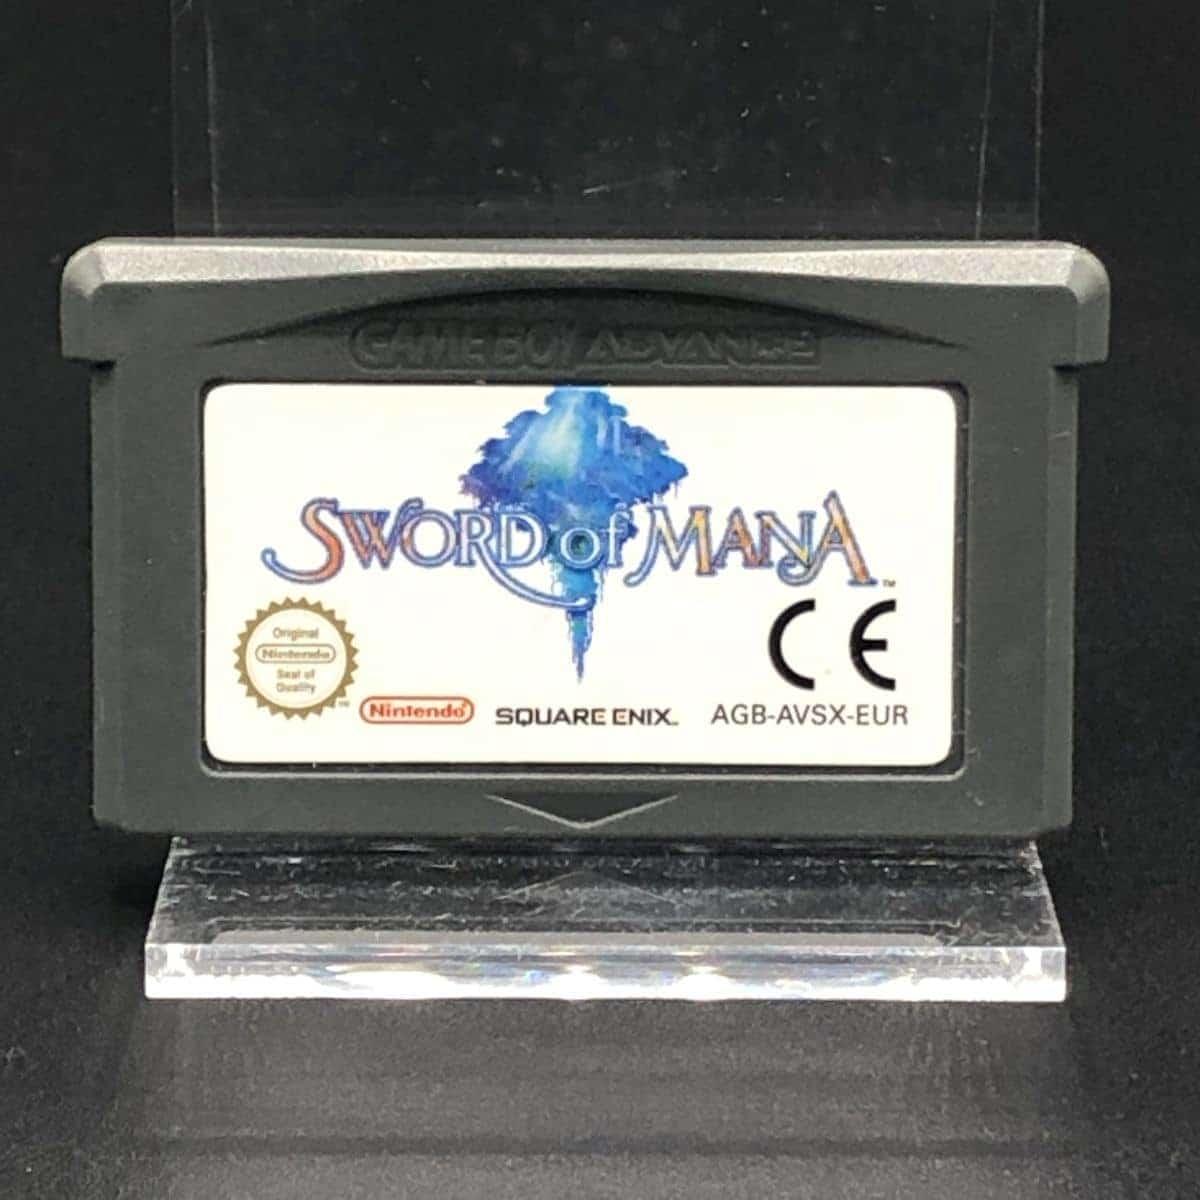 GBA Sword of Mana (Modul) (Sehr gut) Game Boy Advance